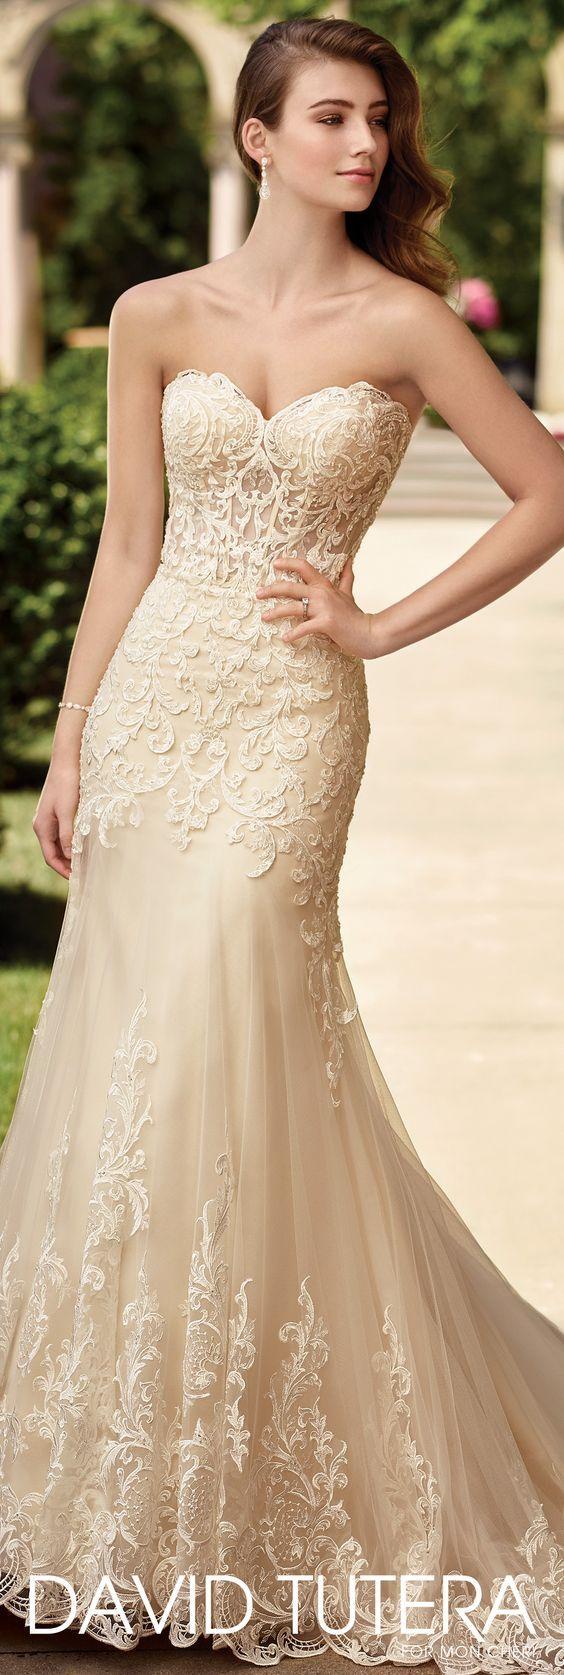 Lace wedding dress cheap december 2018  best wedding dresses images on Pinterest  Bridal gowns Short